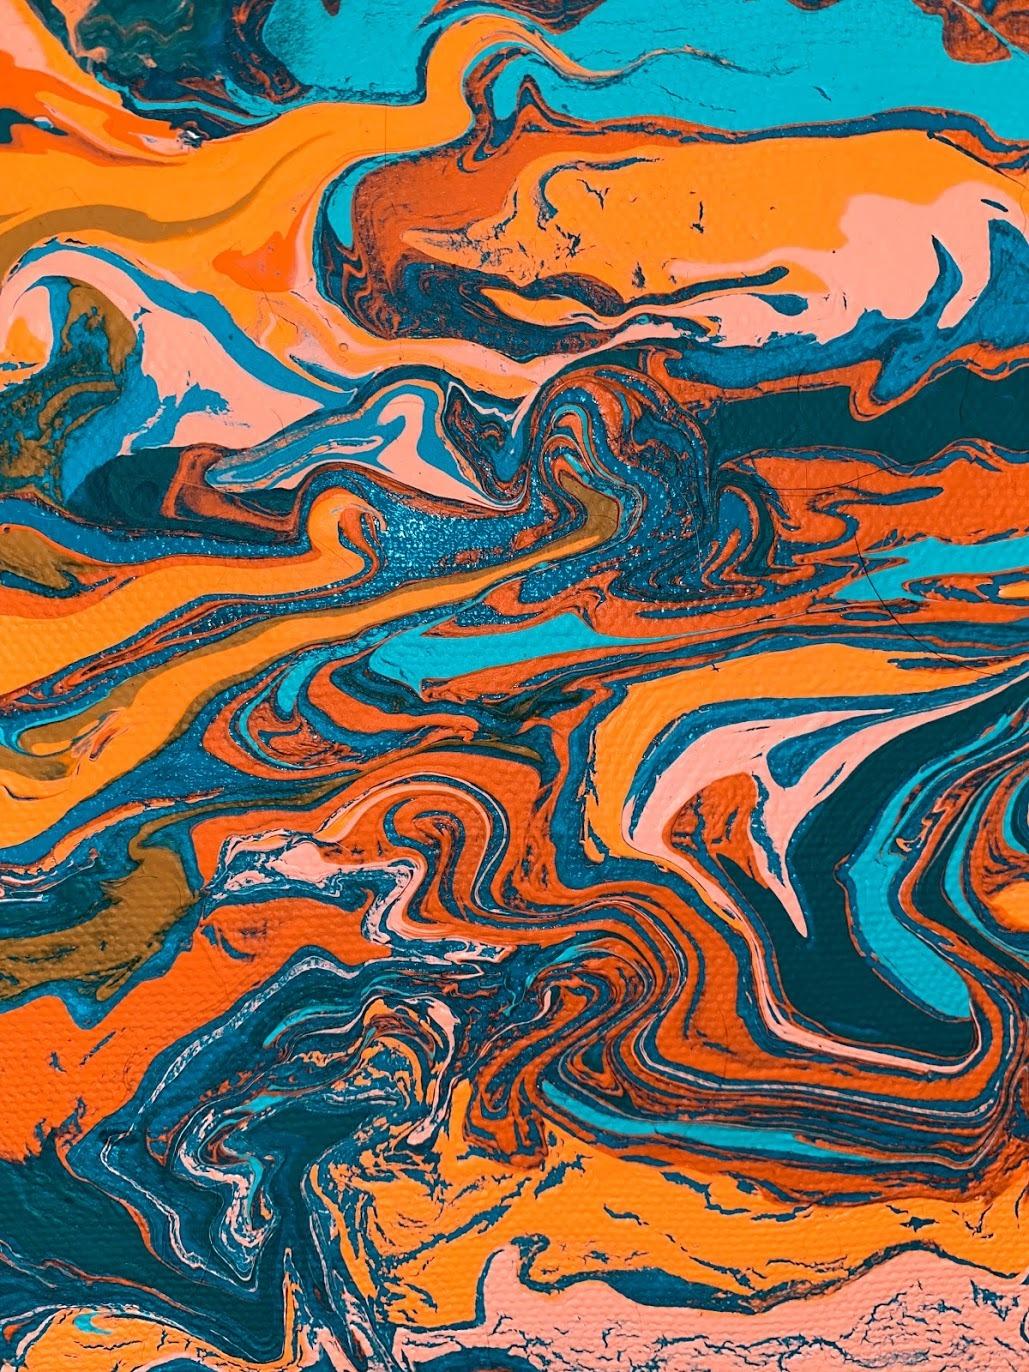 #art#emotion#orange#blue#acrylic painting#painting#artist#colors#waves#contemporary art#artistsupport#modern art#surealism#surealart#sureal#ocean#colorful#rainbow#motion#my art#acrylic